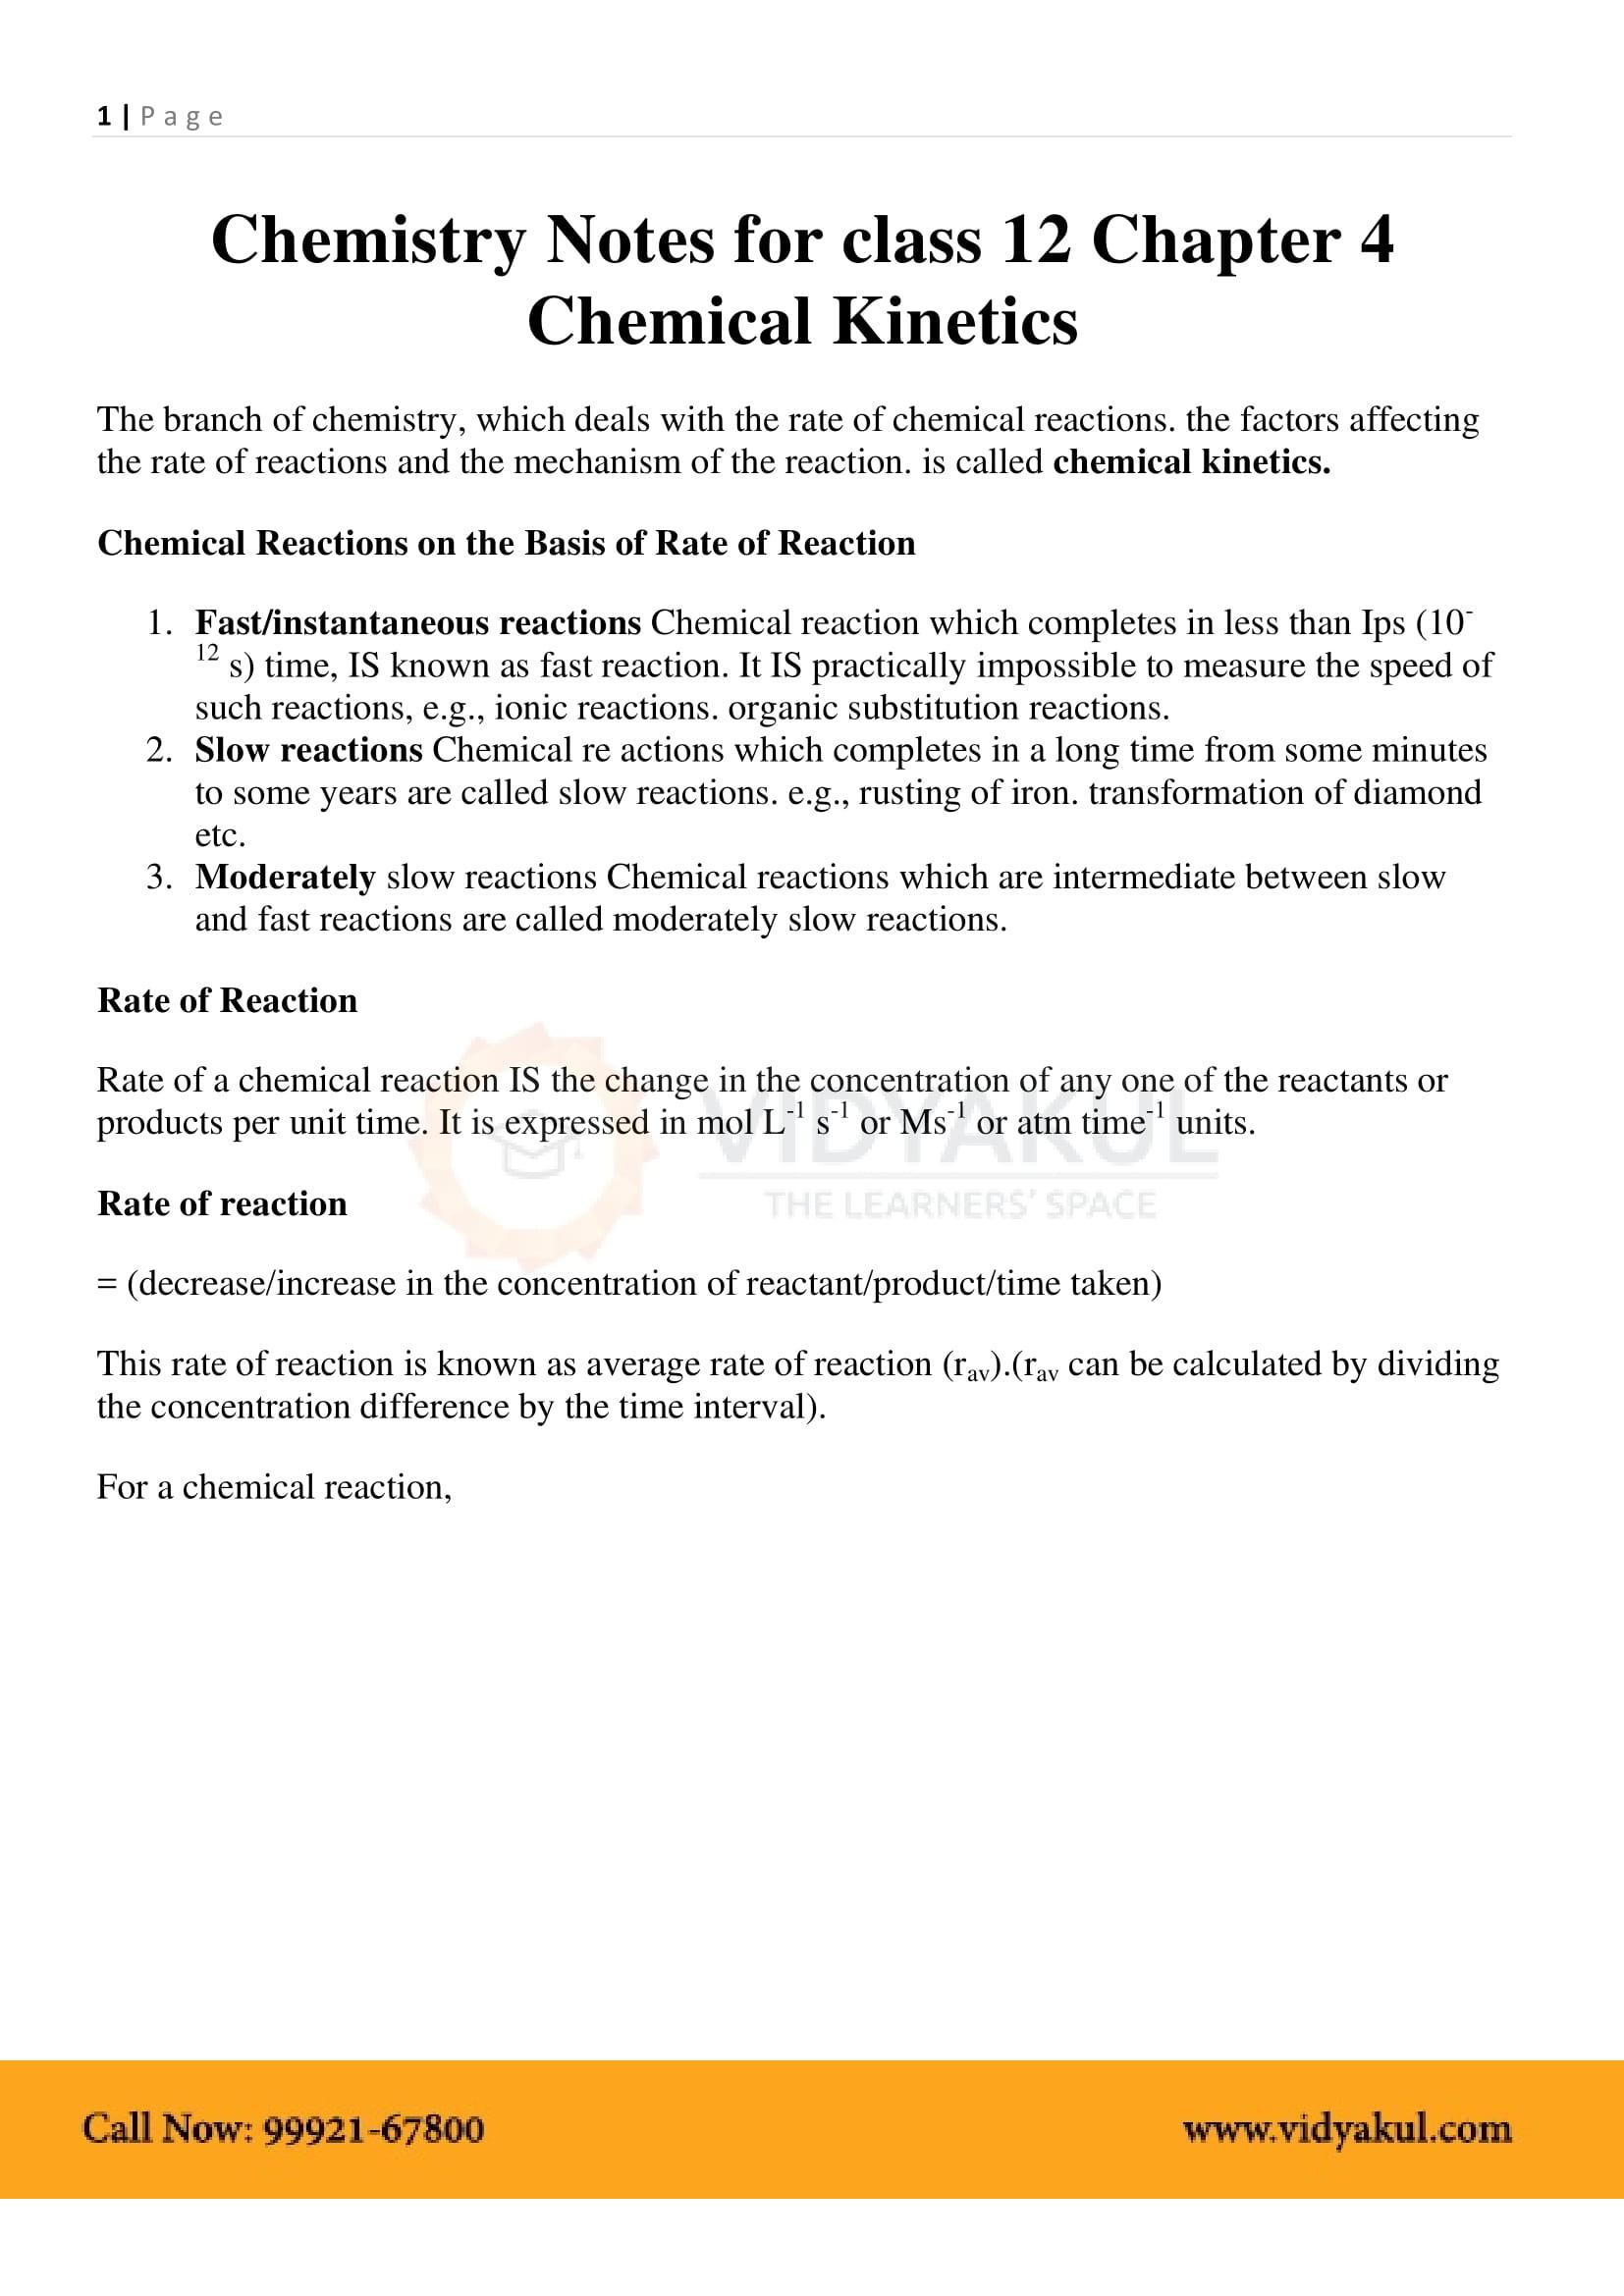 Chemical Kinetics Class 12 Notes | Vidyakul